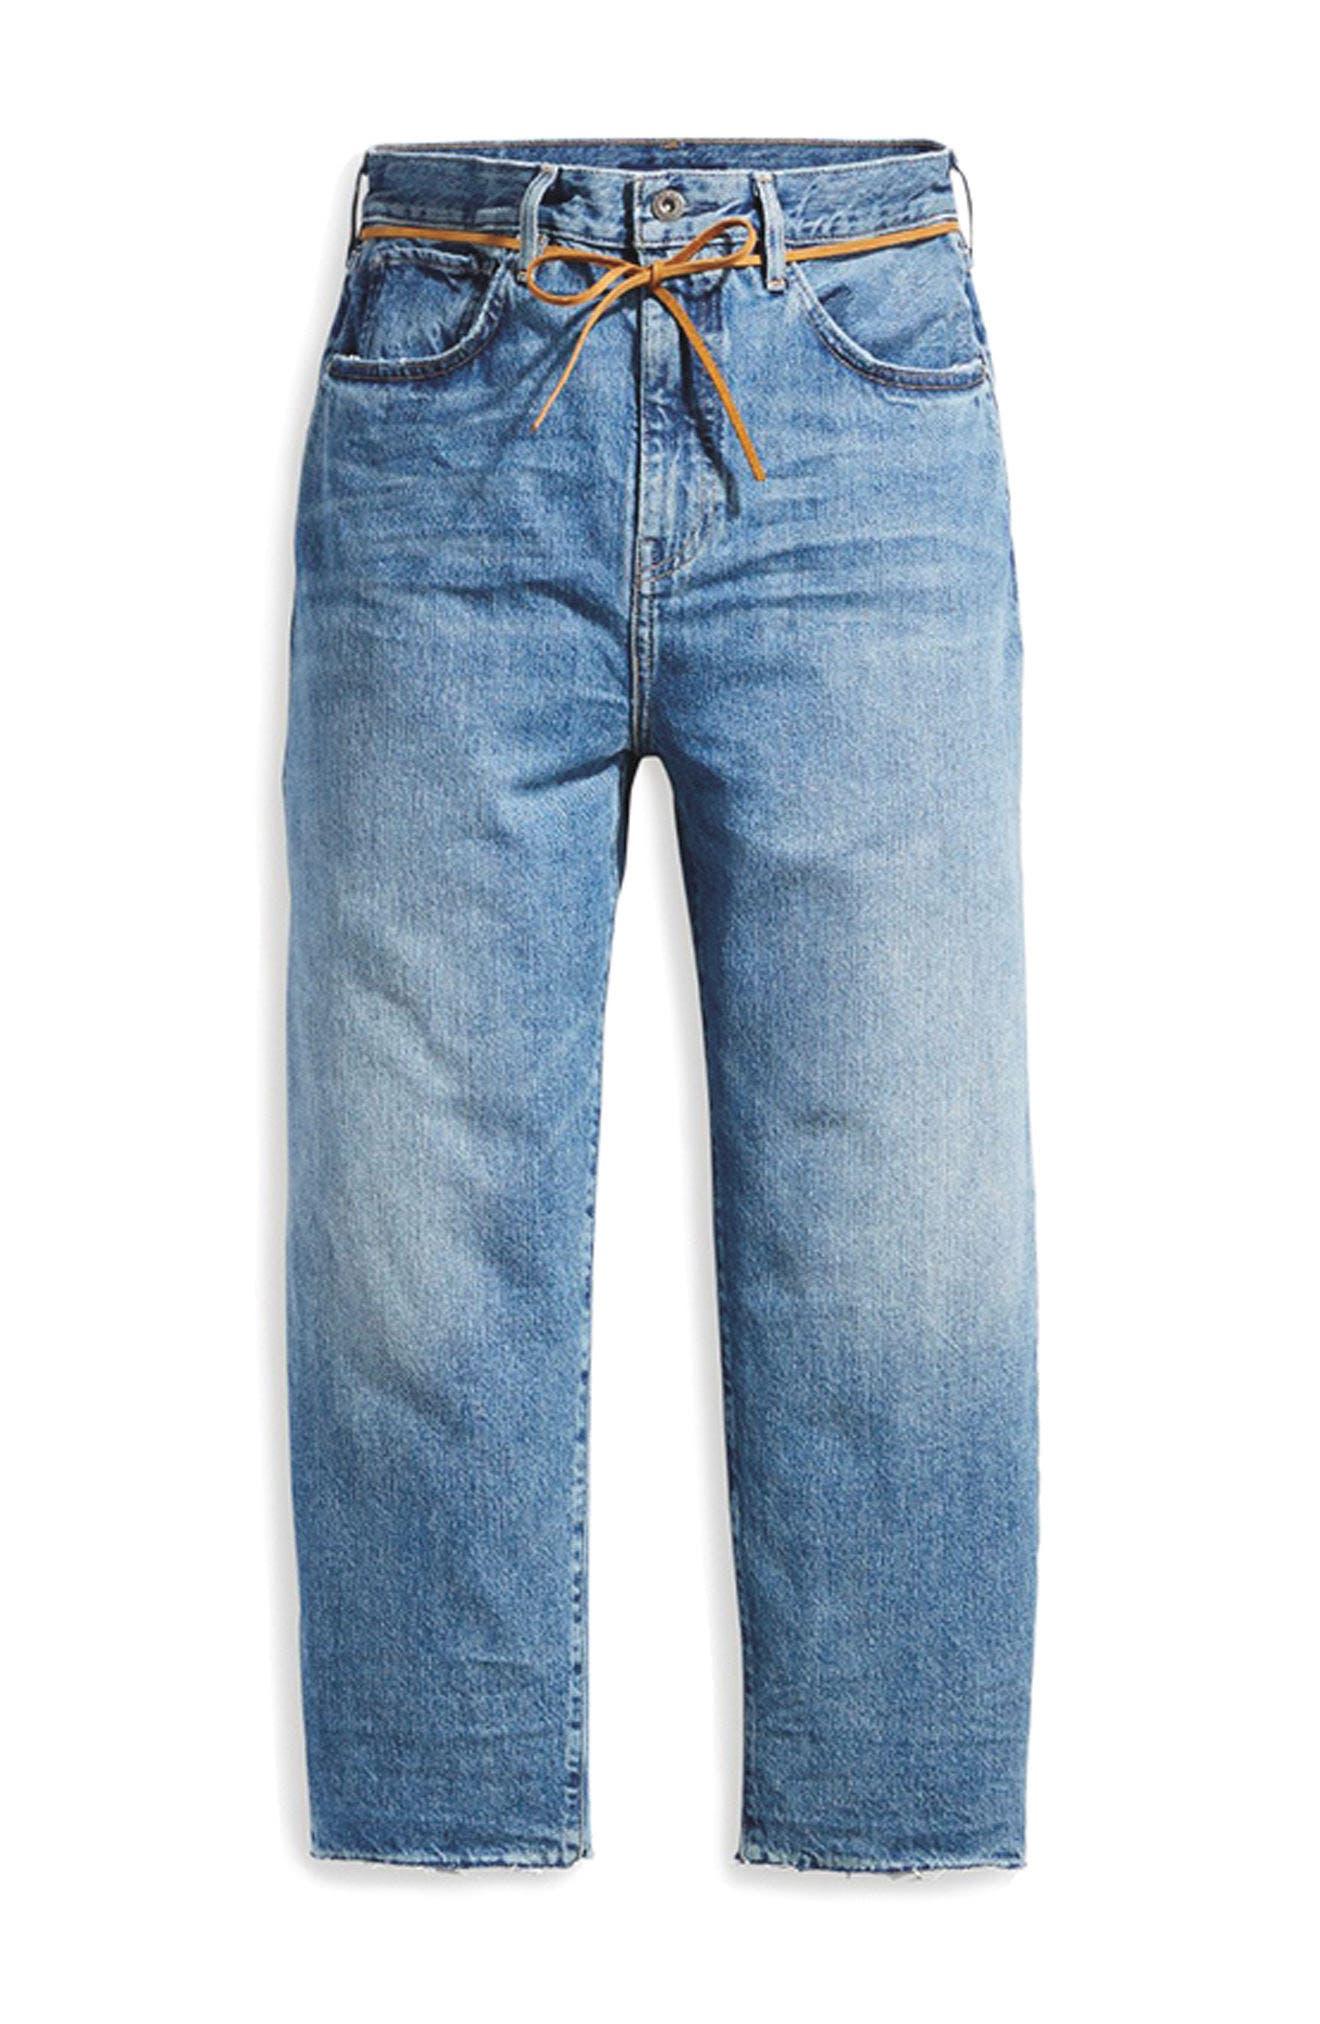 Barrel Jeans,                             Alternate thumbnail 7, color,